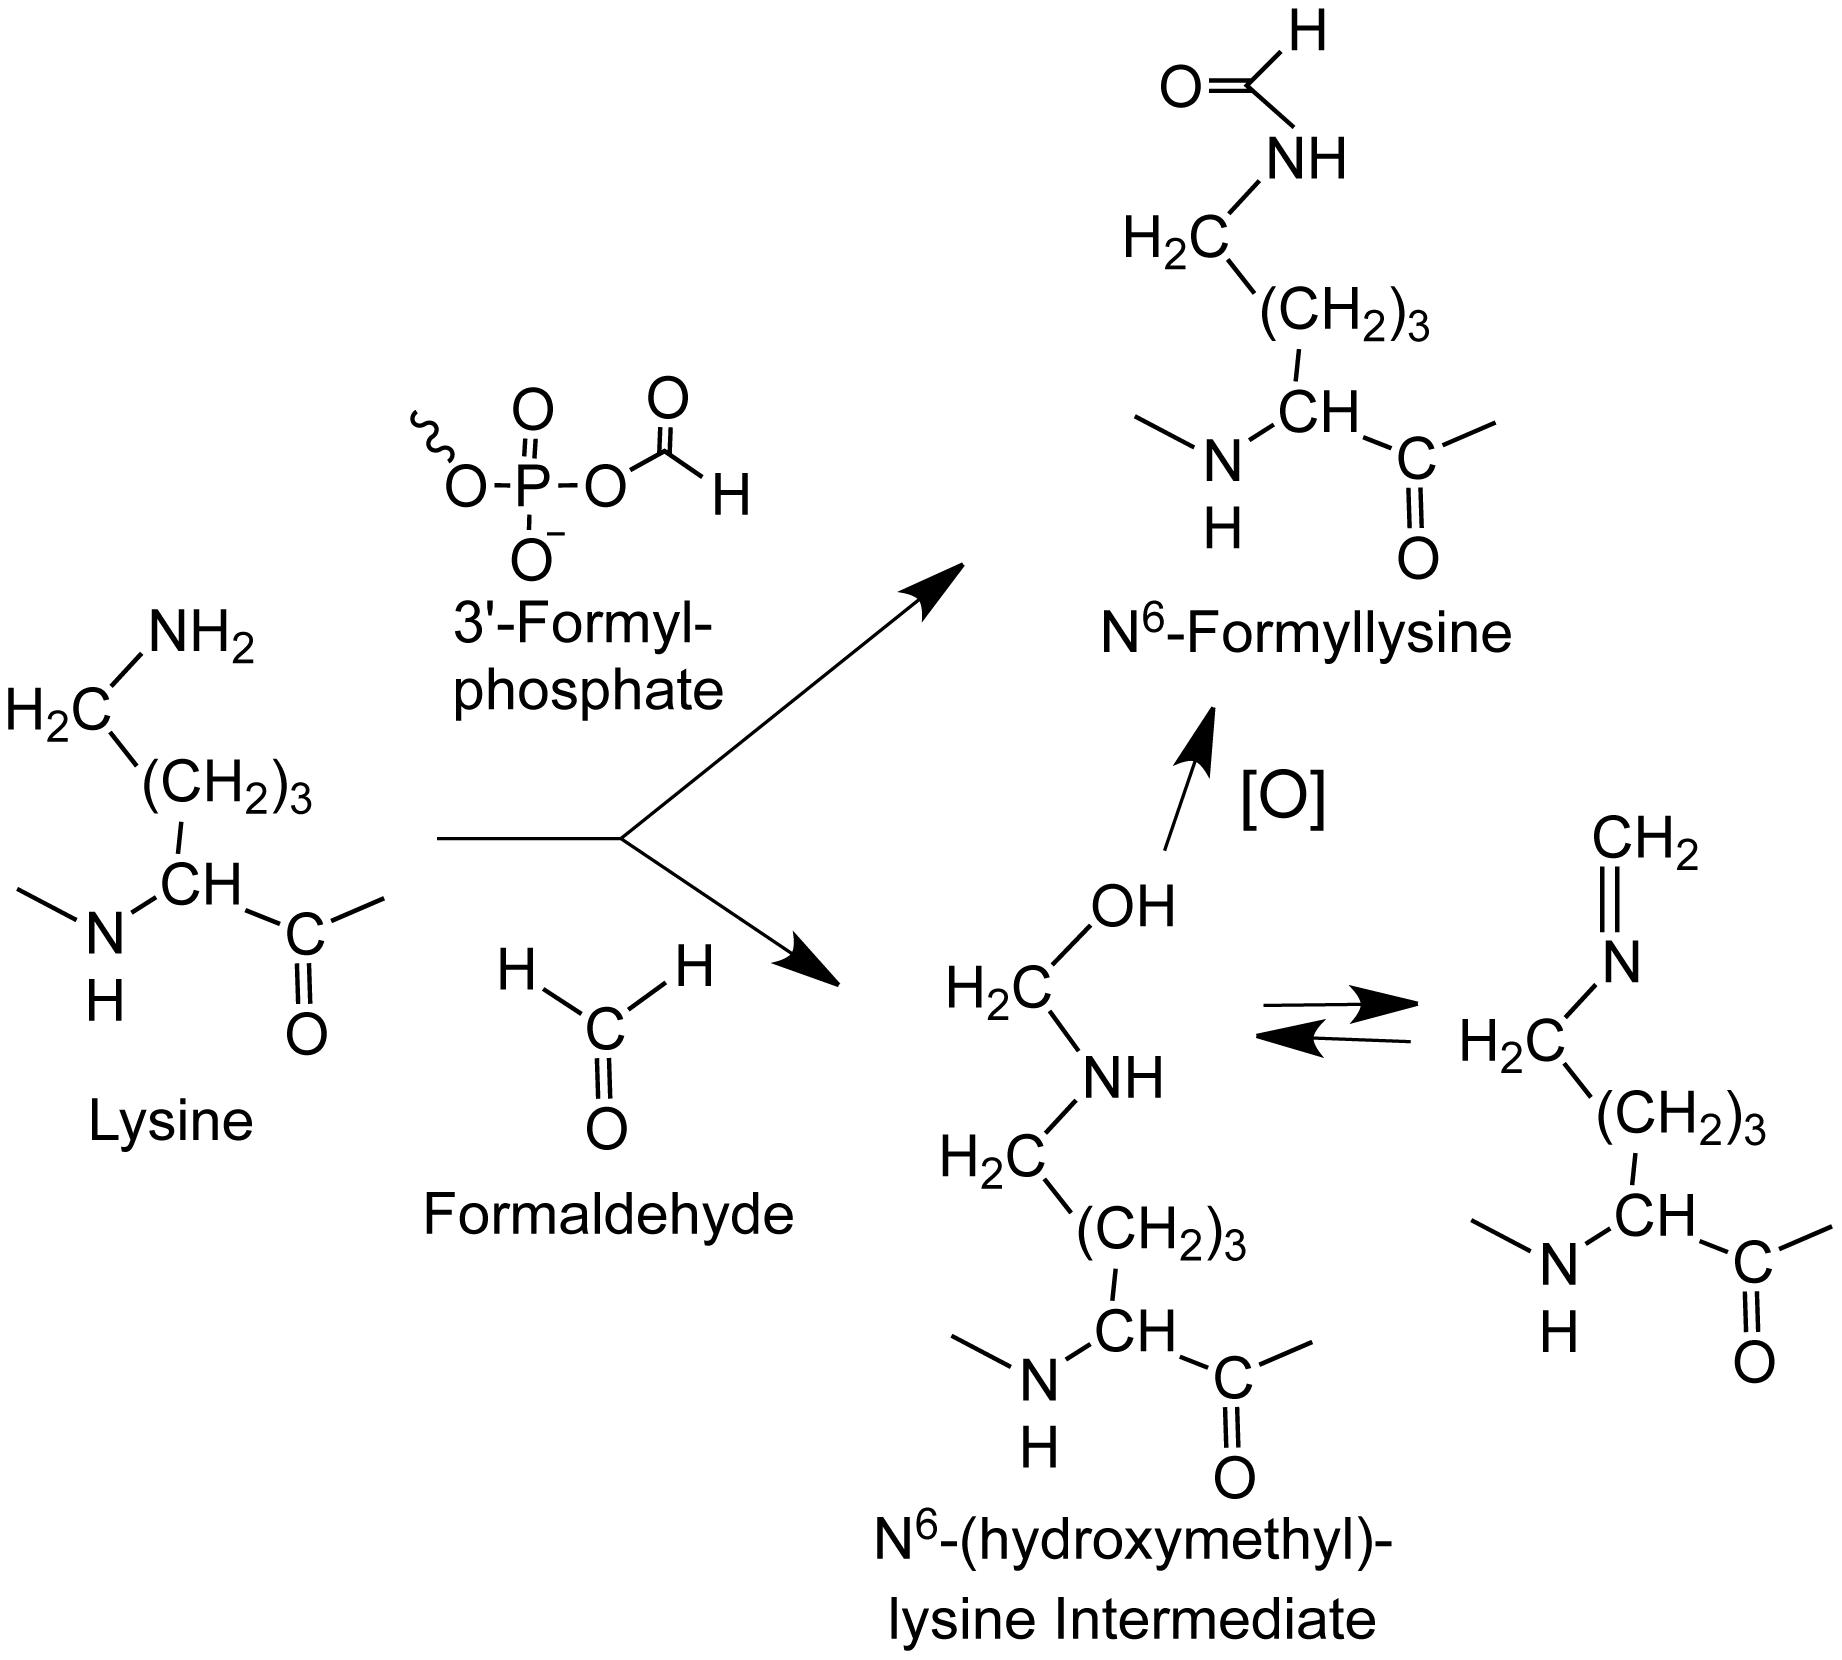 Sources of N<sup>6</sup>-formyllysine.